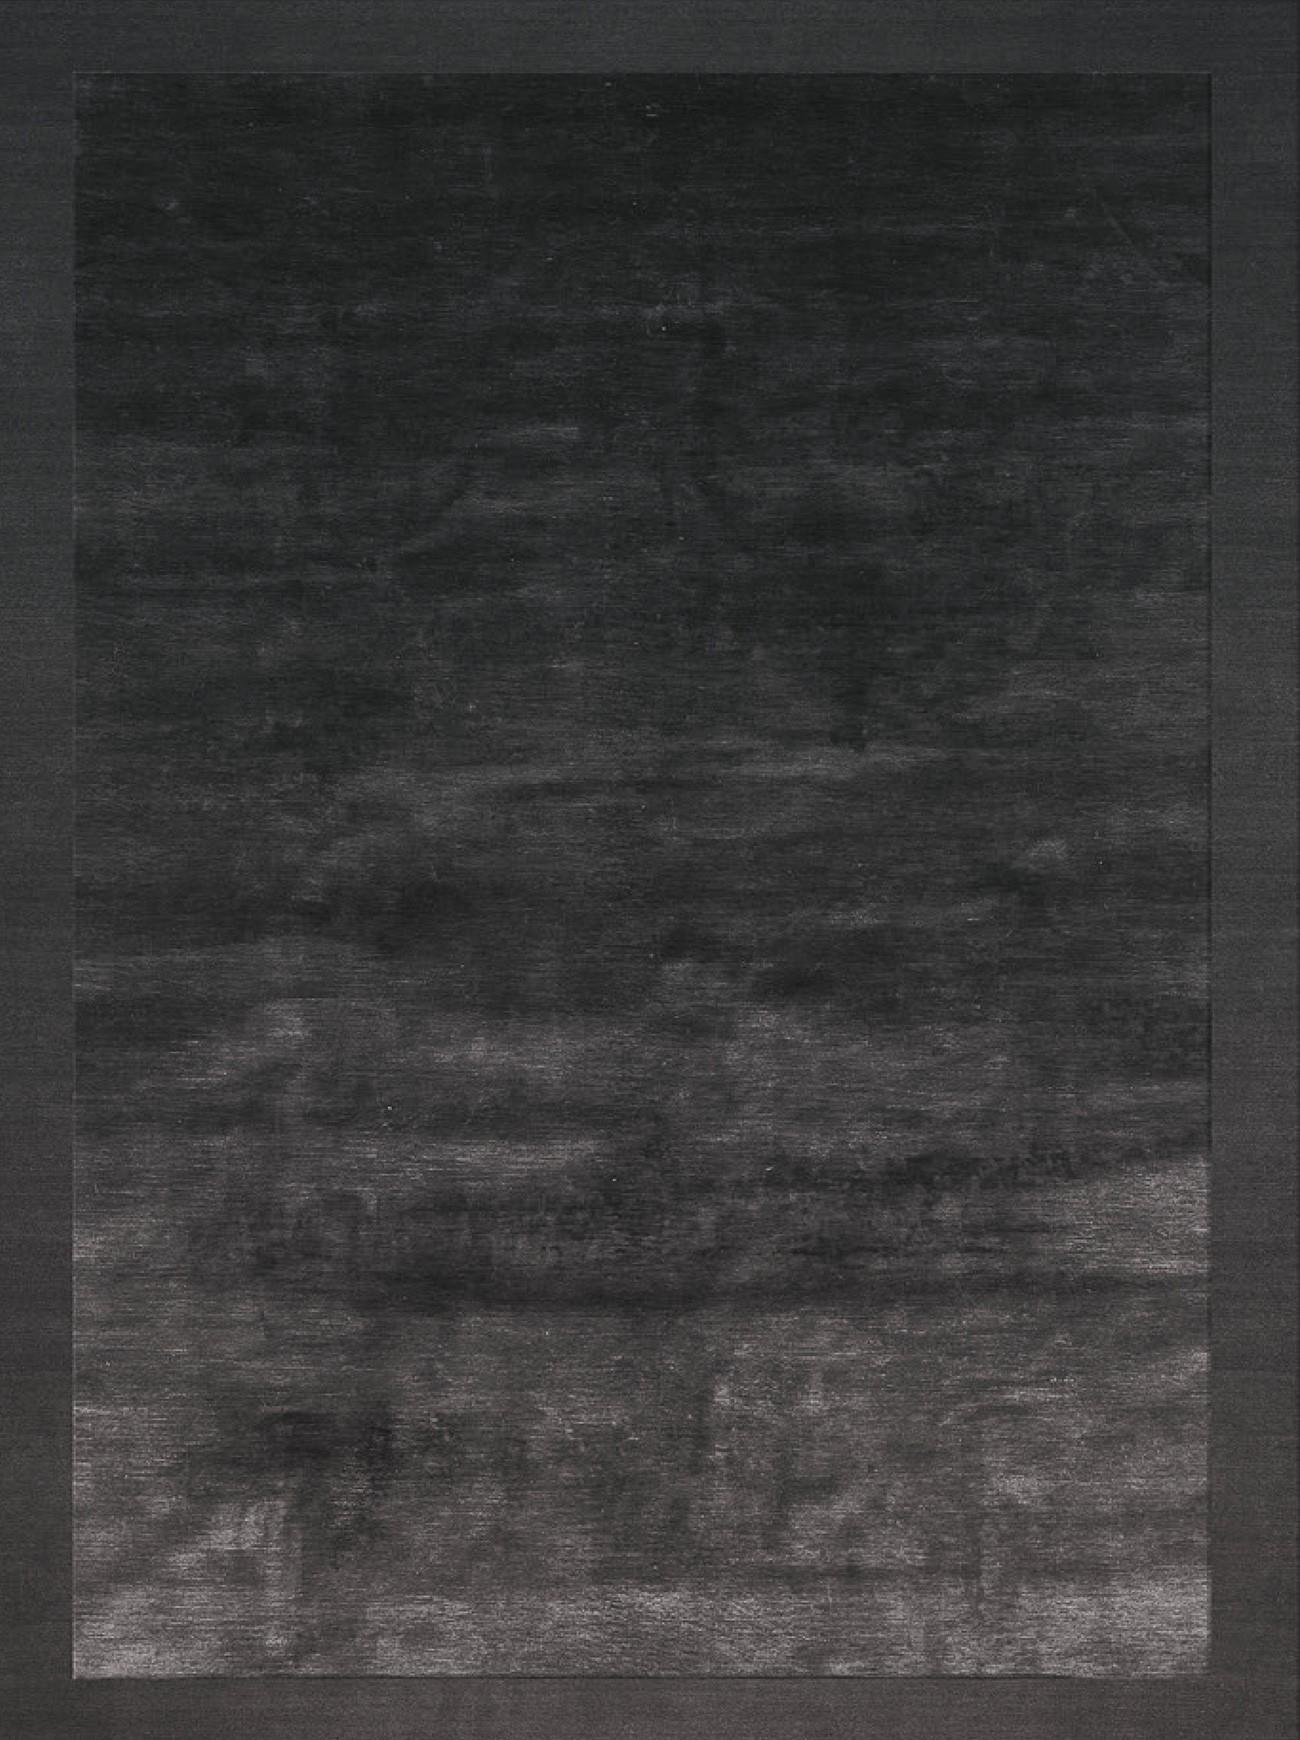 Poliform_tappeti_FRAME_06_finiture_1300x1740px_Carbone